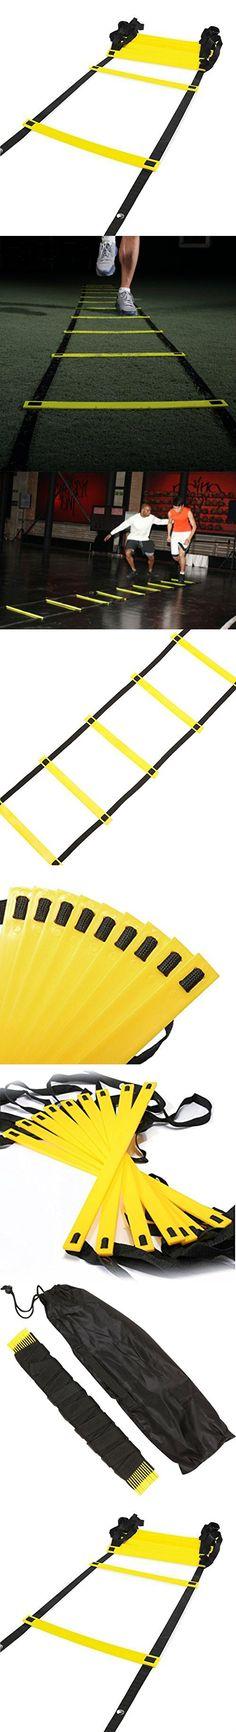 YIMAN Soccer Training Agility Ladder 20 Rung